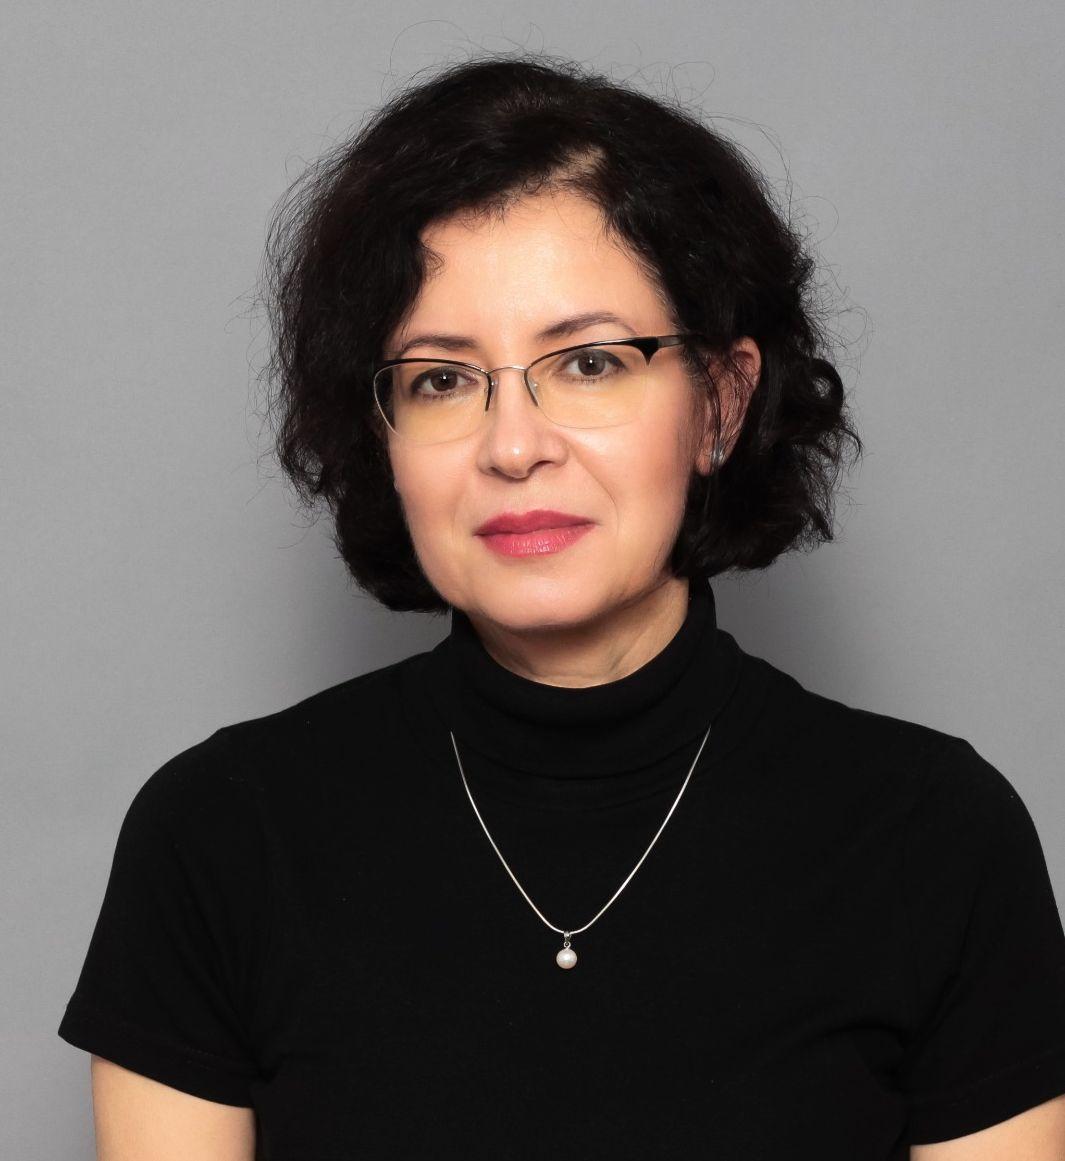 psiholog Mihaela Preda - Cabinet individual de Psihologie și Psihoterapie